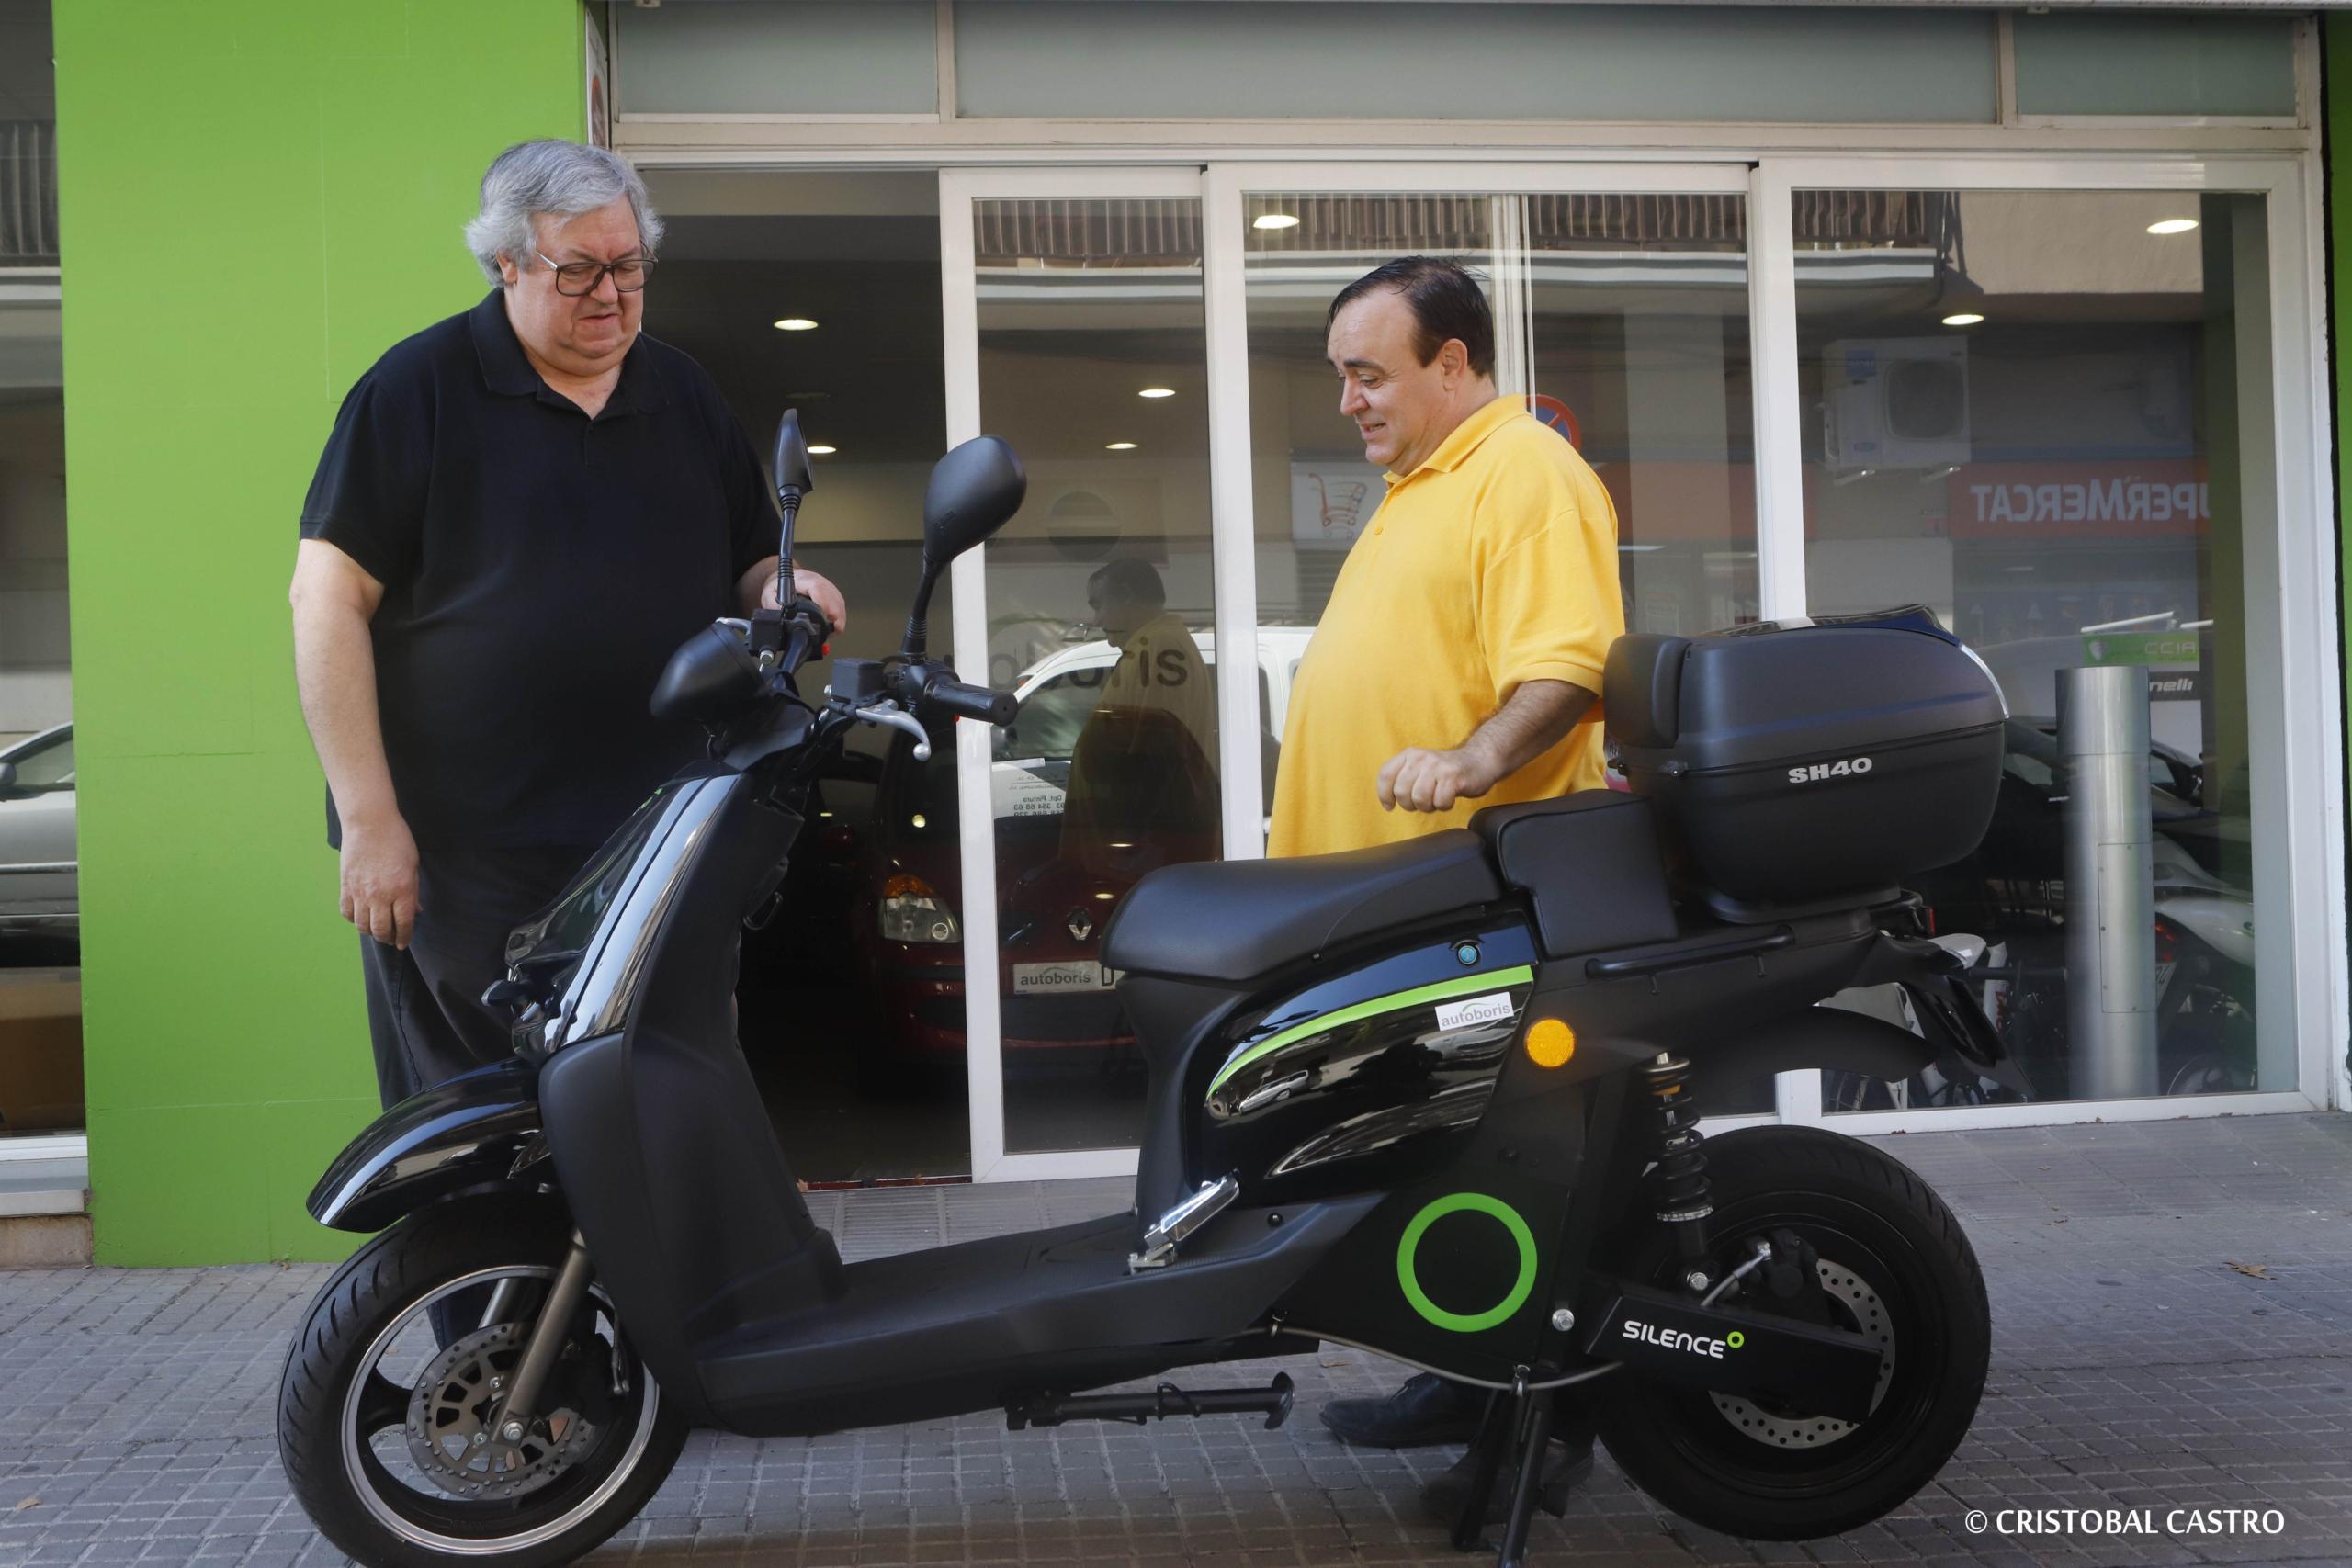 Miquel Baco, de Don Piso, recollint la moto elèctrica a Autoboris Terrassa | Cristóbal Castro